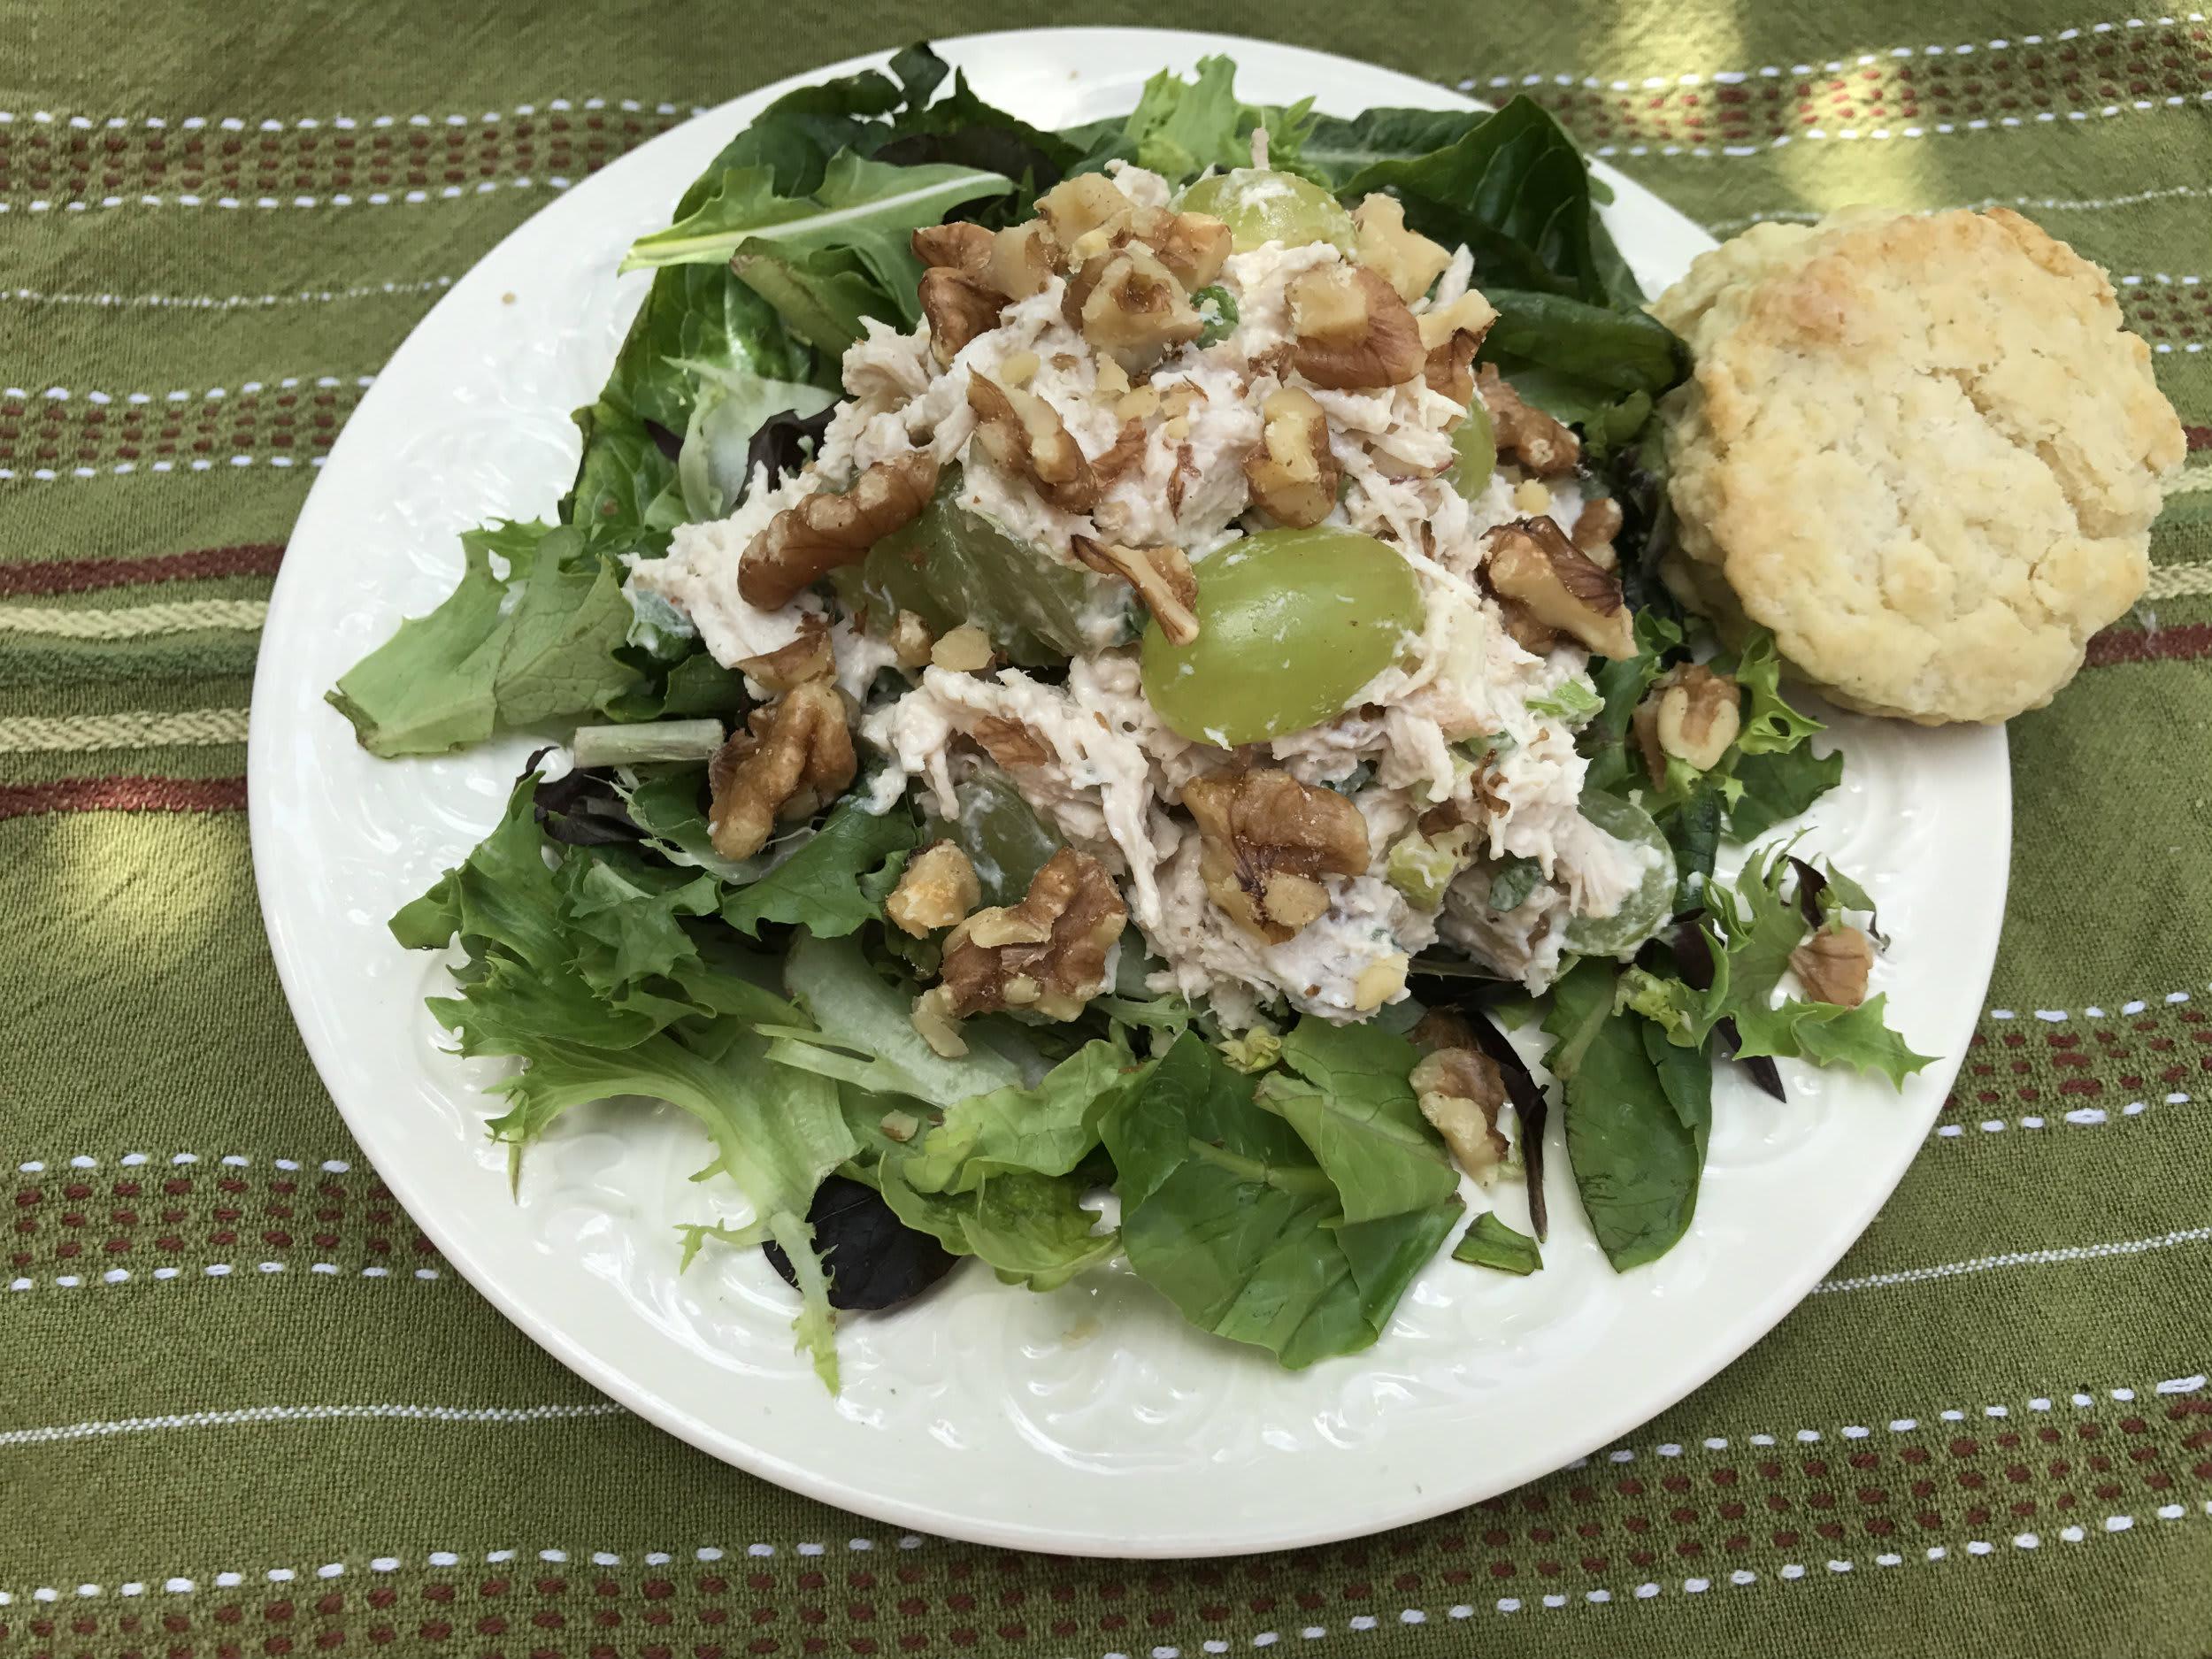 Fall Chicken Salad Recipe from Ypsilanti's Parish House inn